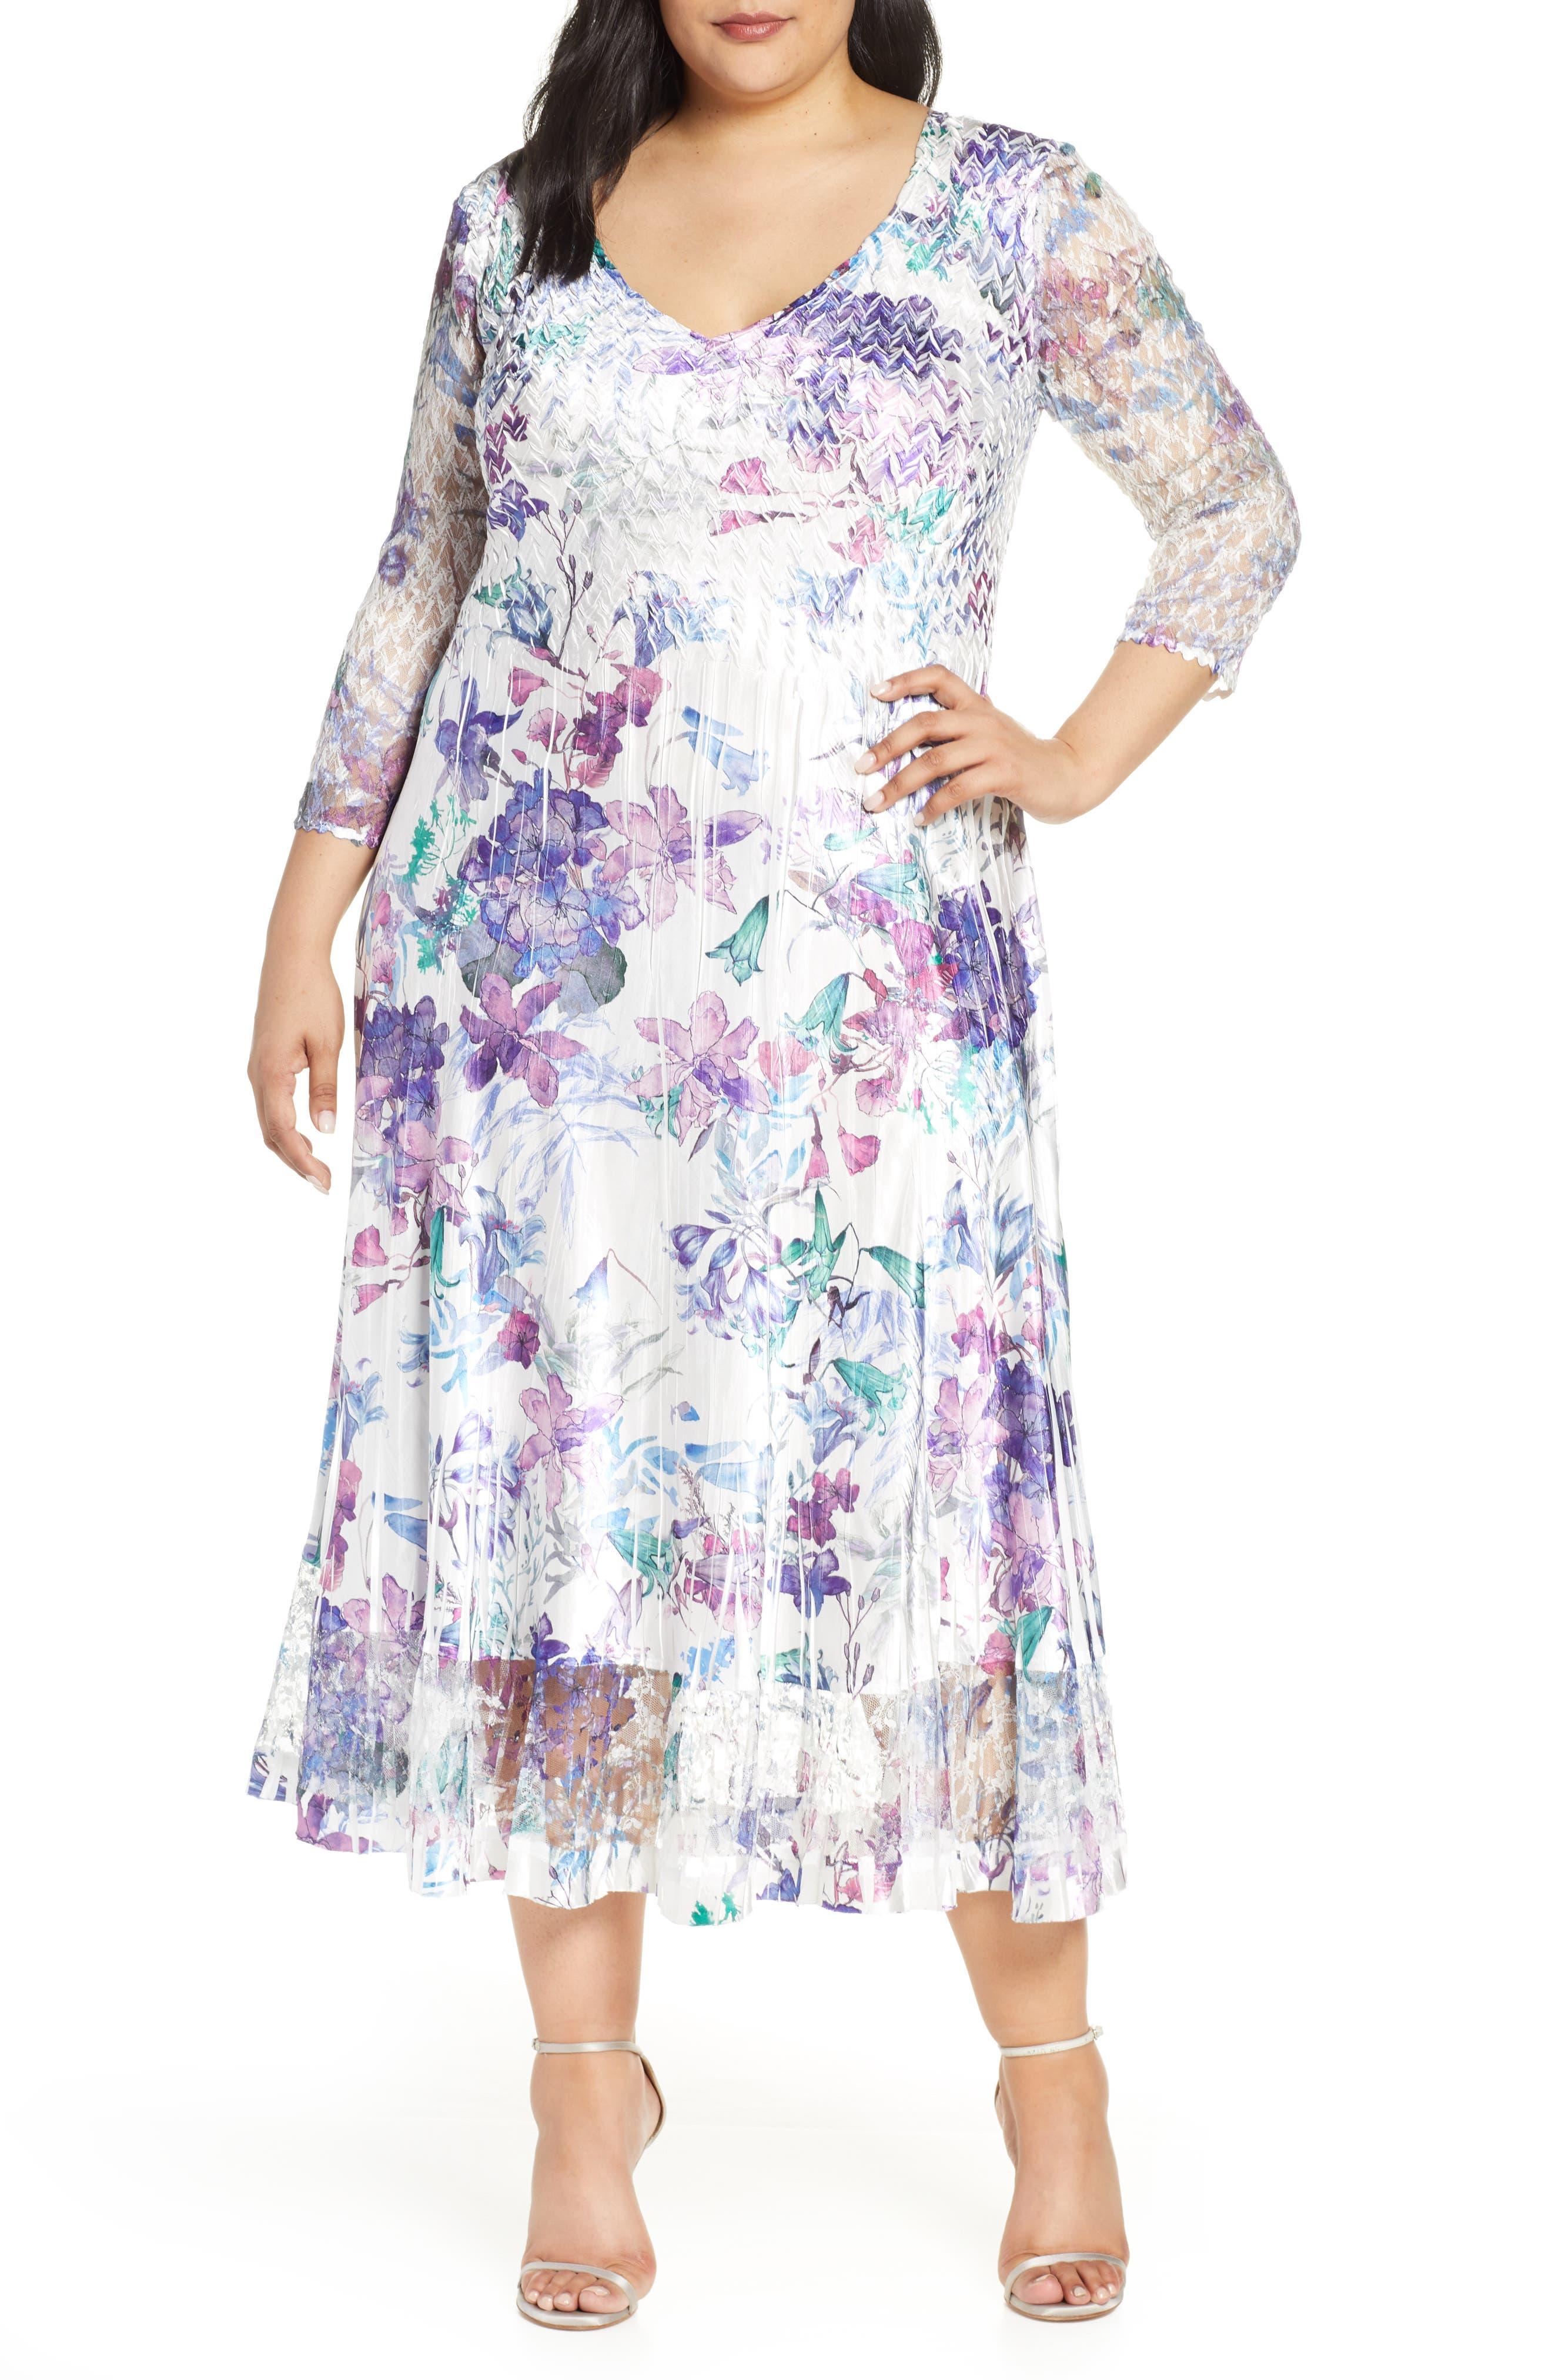 Plus Size Komarov Floral Print V-Neck Charmeuse Tea Length Dress, Ivory